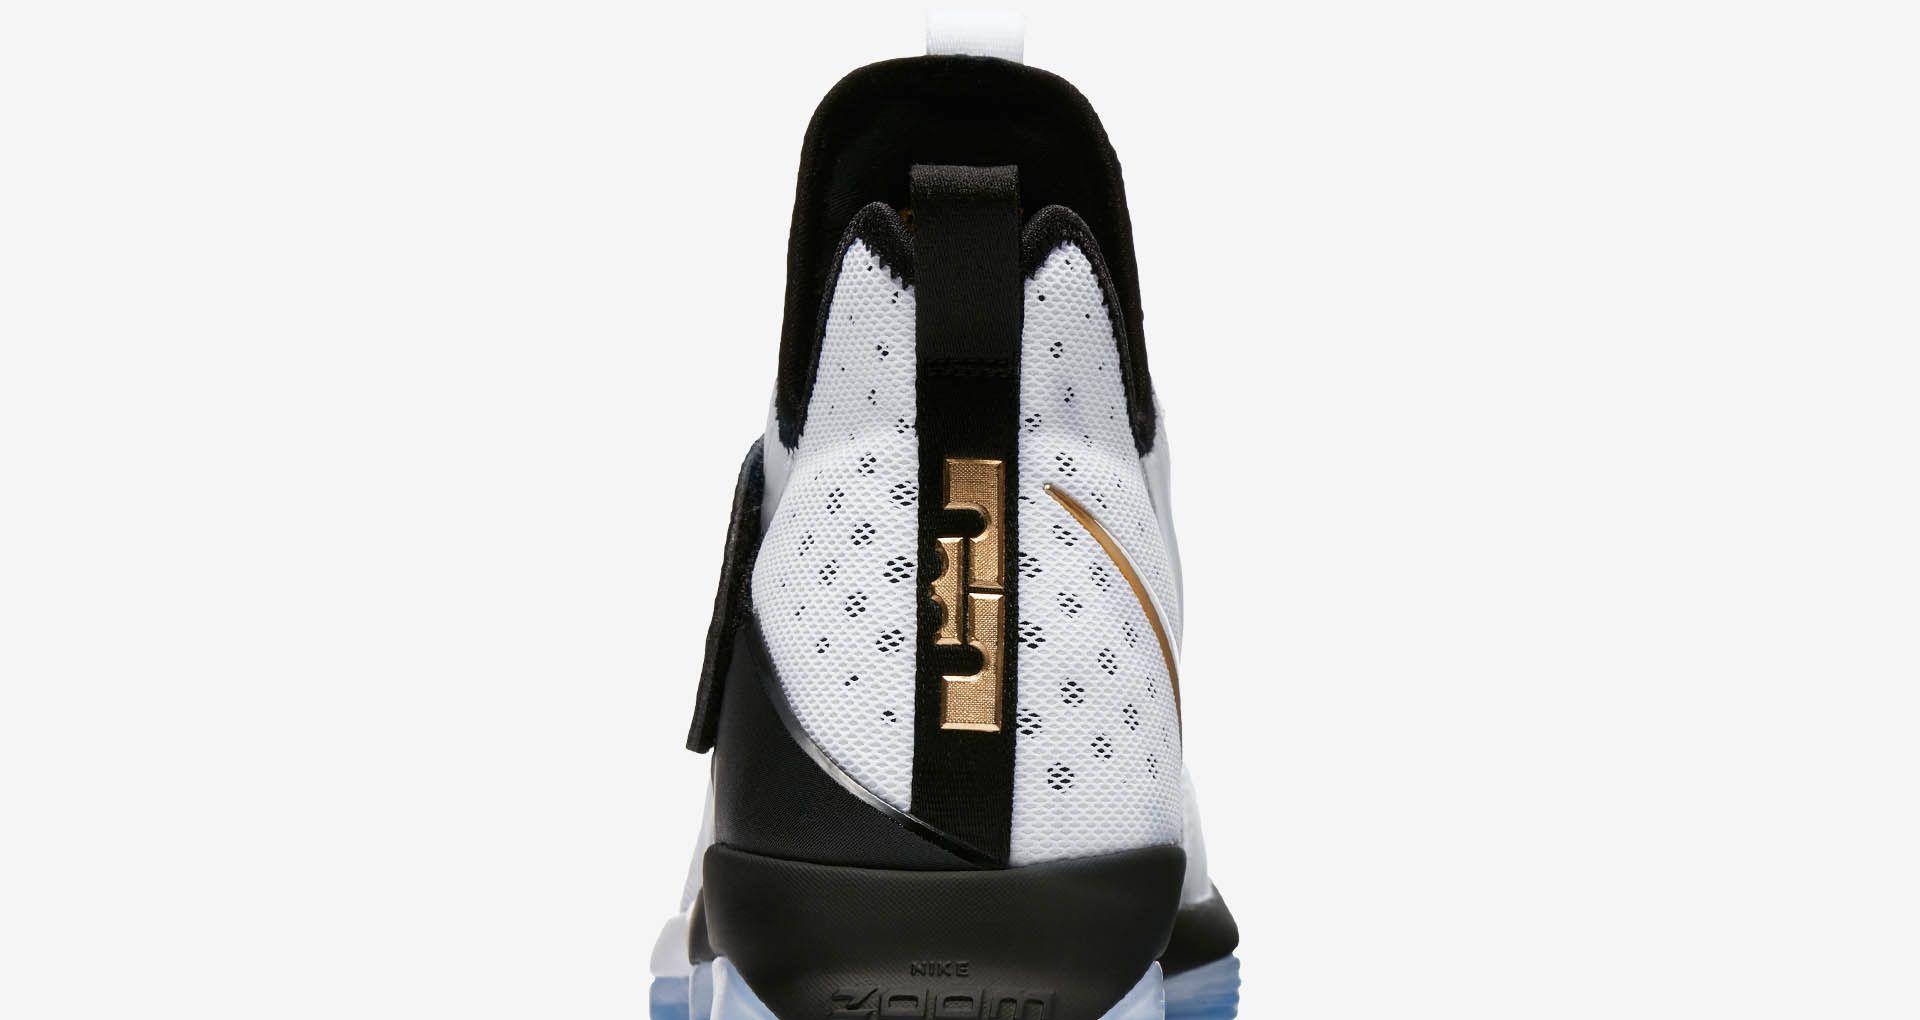 sale retailer 078d6 91b13 Nike LeBron 14 BHM 2017